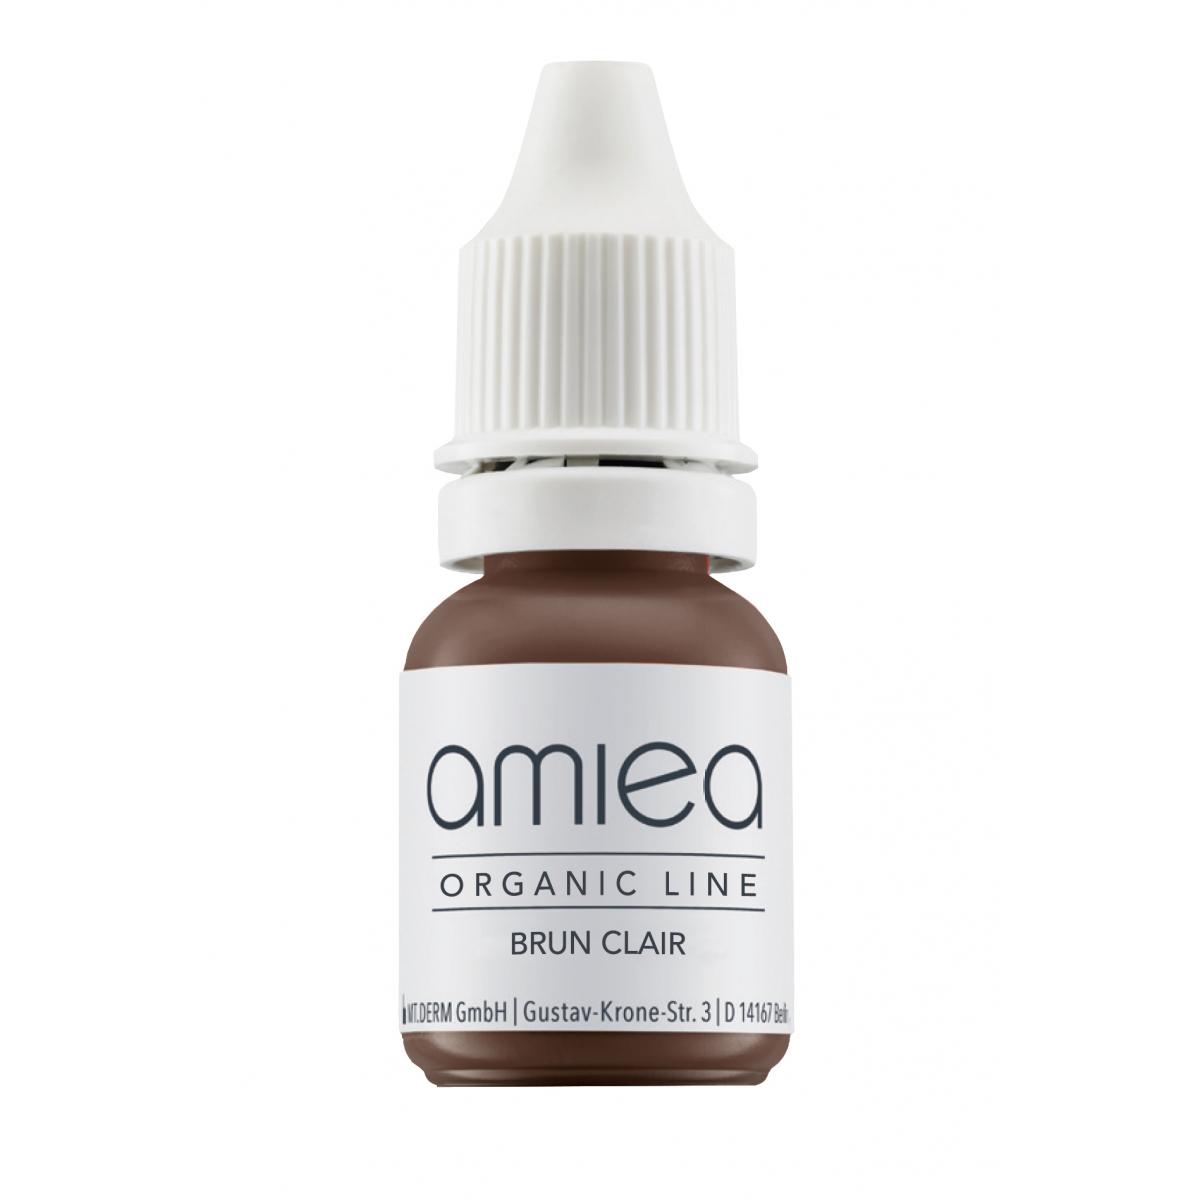 ORGANIC LINE (10ml) - PIGMENT BRUN CLAIR ORGANICLINE AMIEA (10 ml)